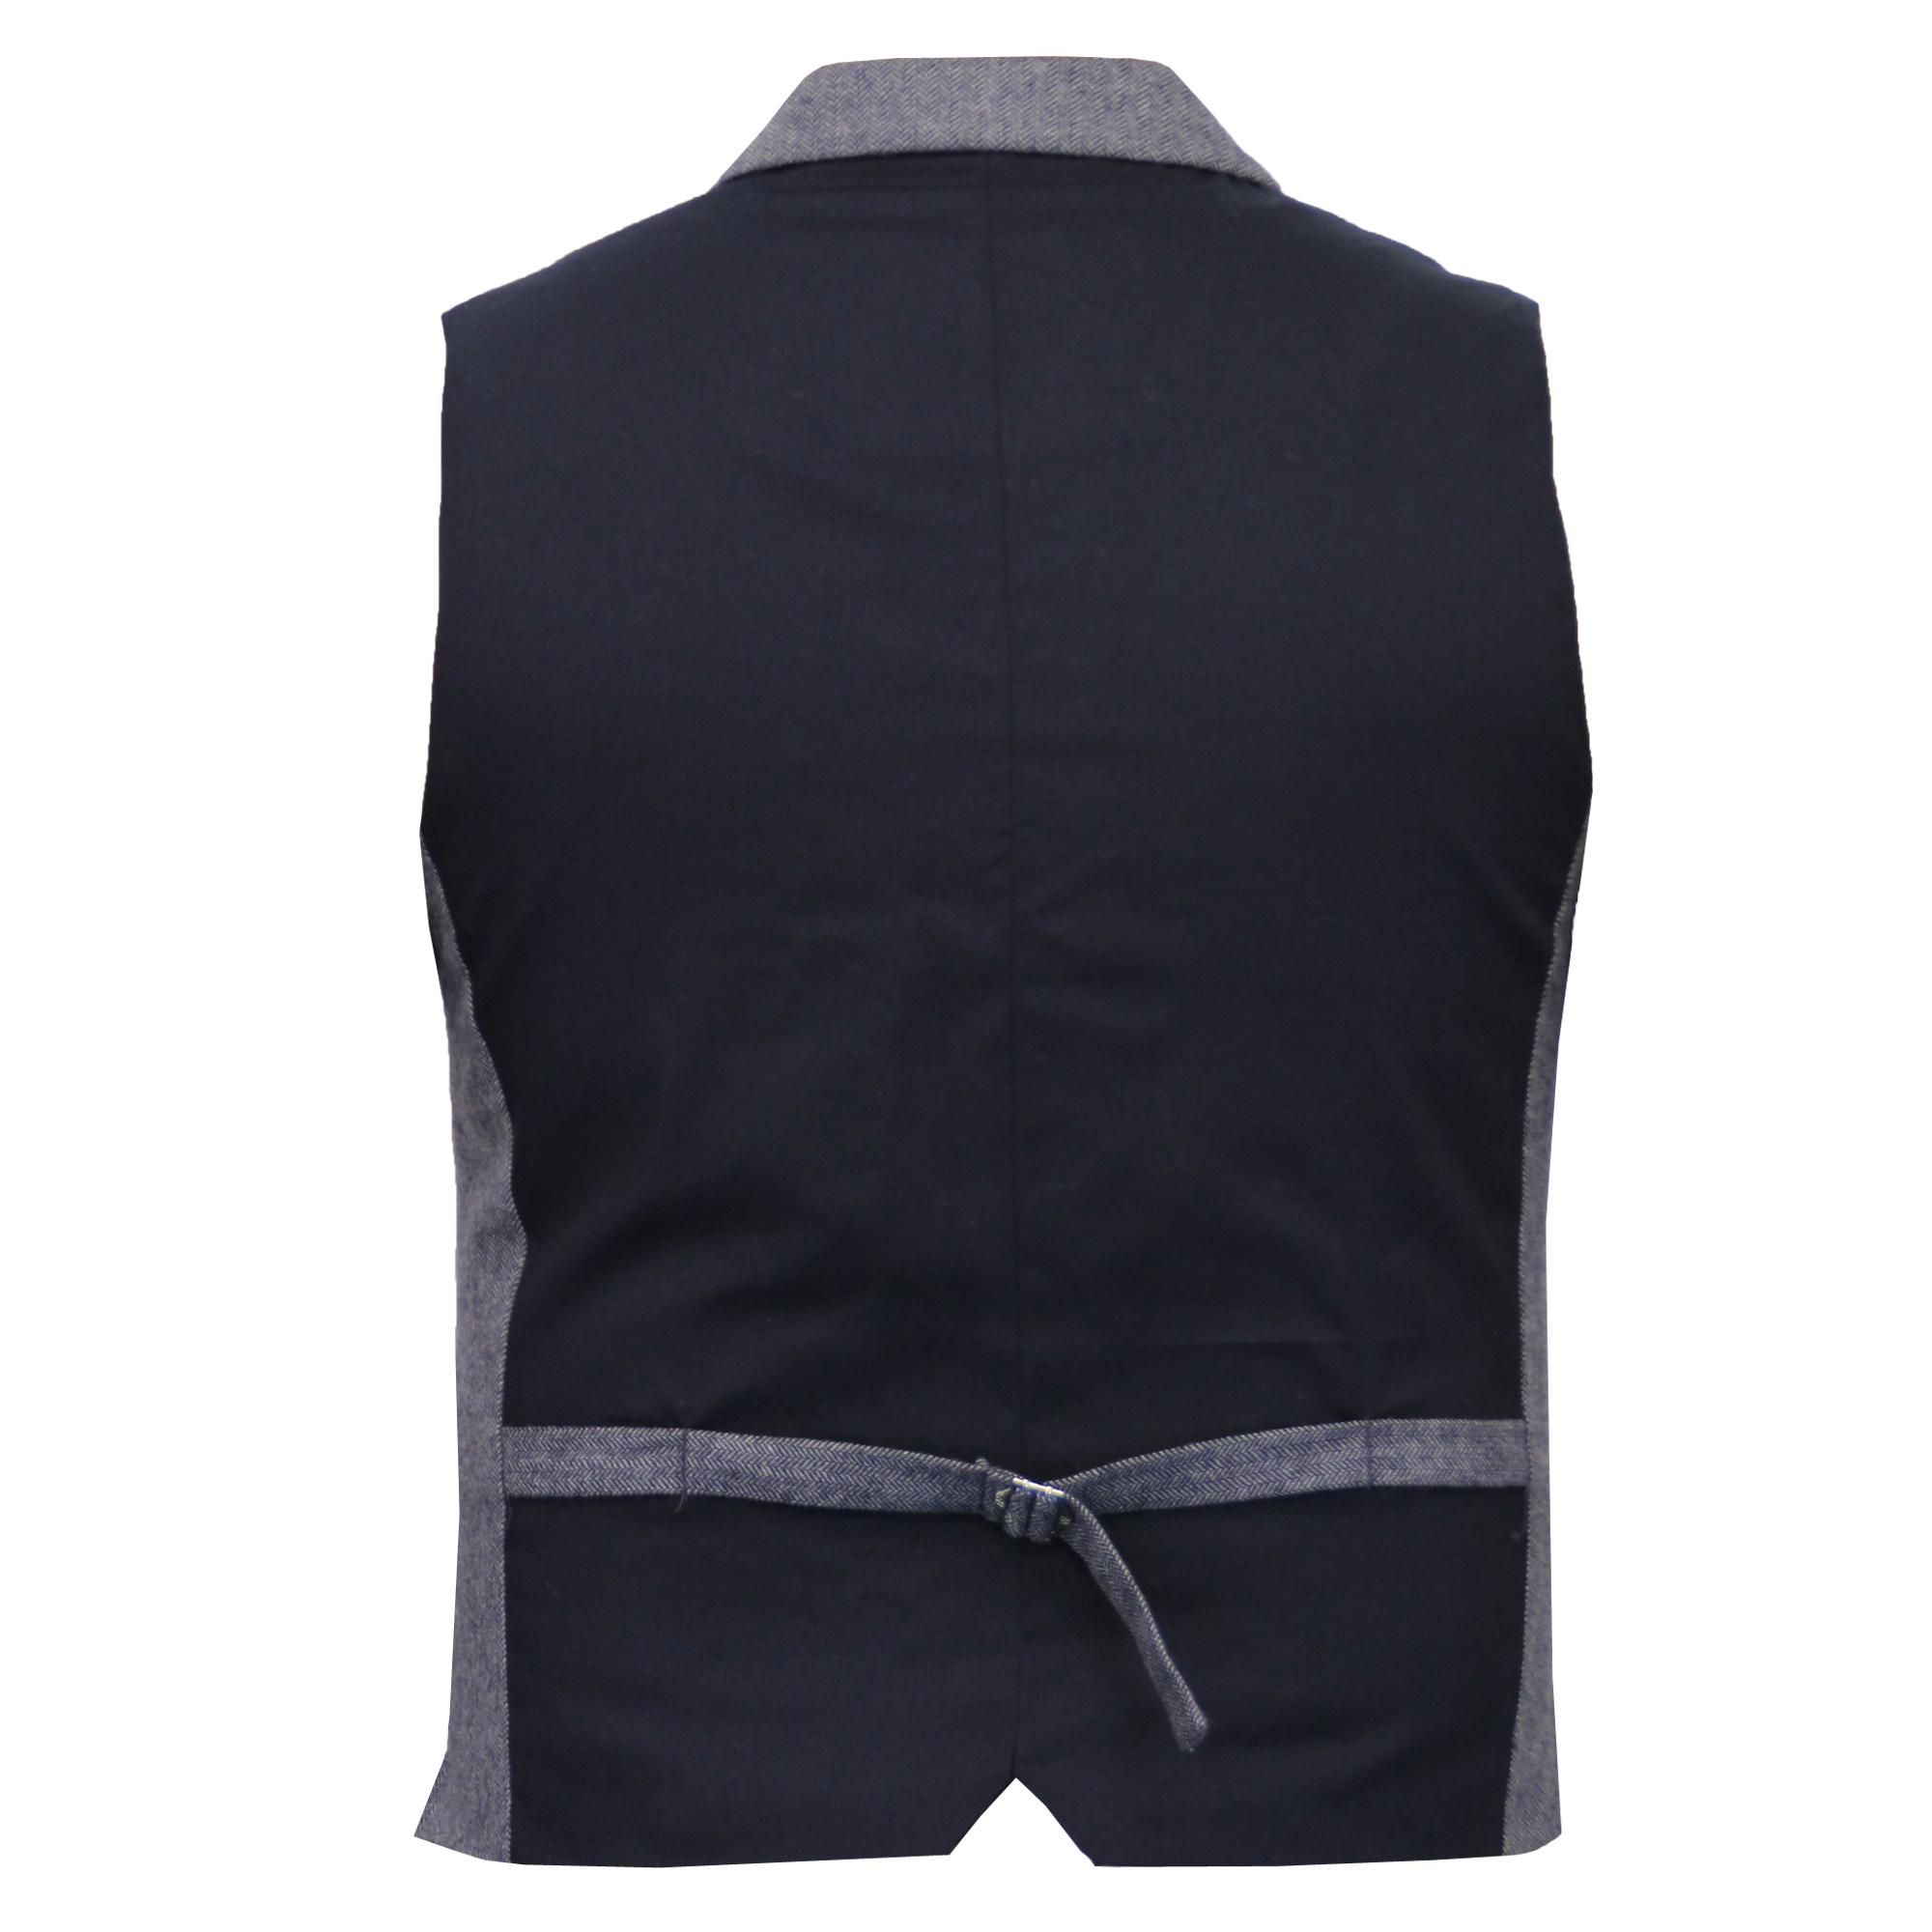 Mens-Waistcoat-Wool-Mix-Cavani-Formal-Vest-Herringbone-Tweed-Check-Party-Smart thumbnail 25